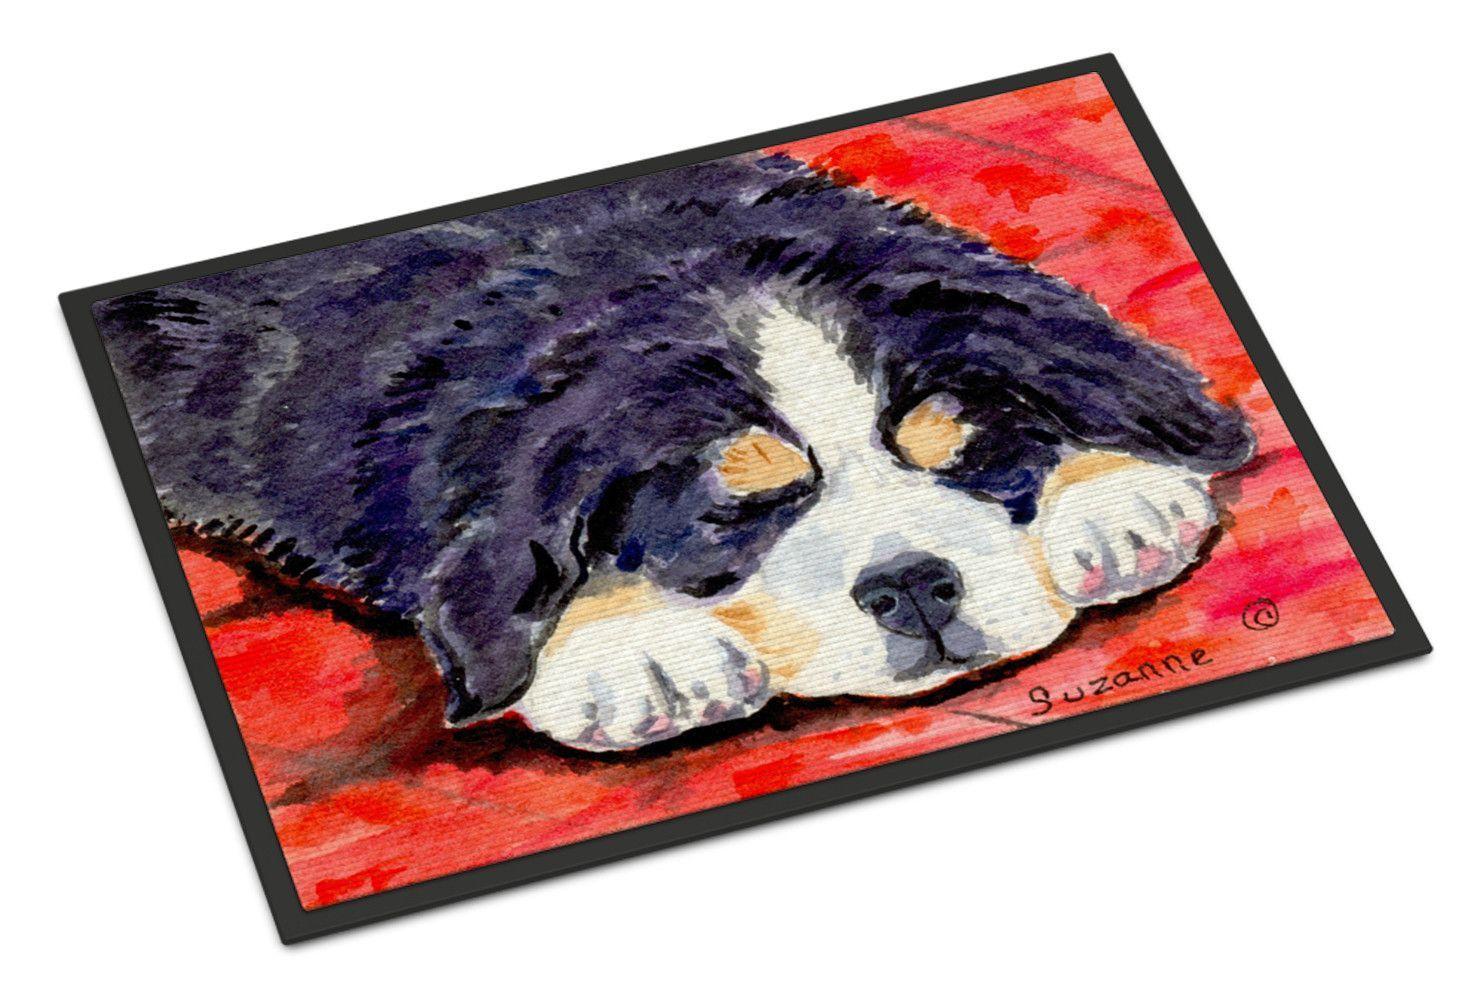 mats outdoor flooring puzzle cal dog great hub puzzlelock ideas floors mat floor lock rubber animal kennel